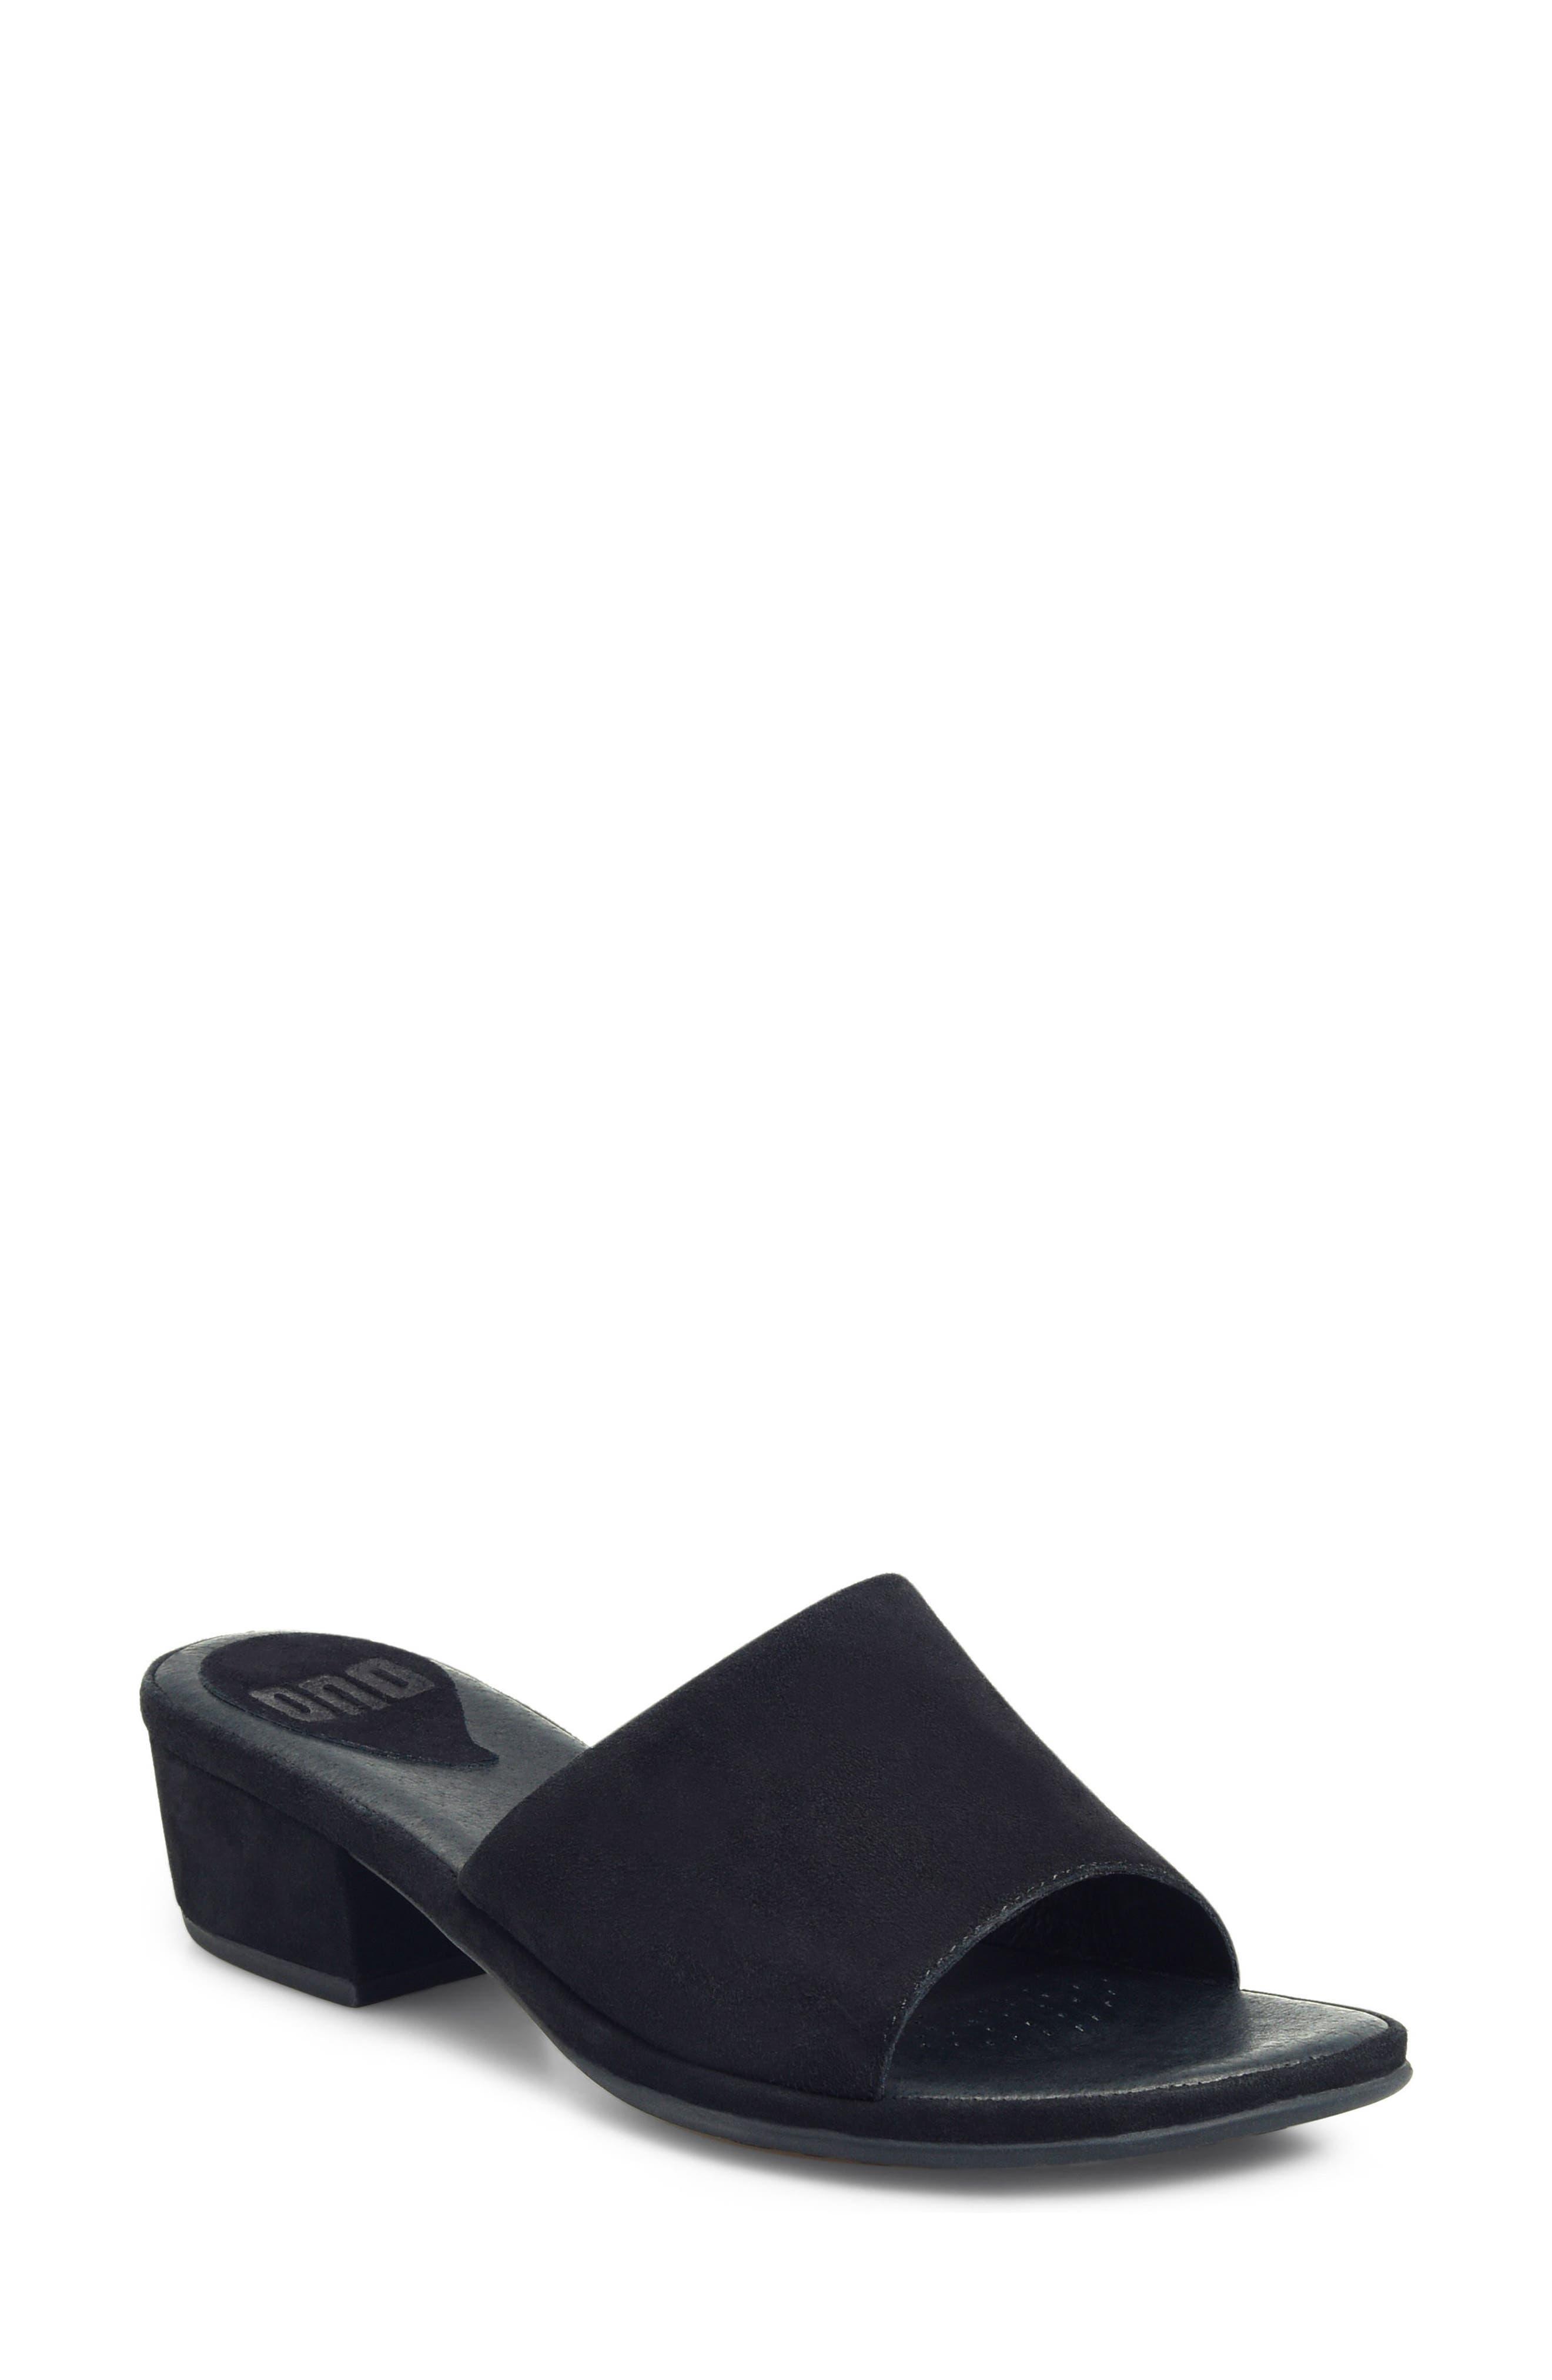 ONO Bo Block Heel Slide Sandal